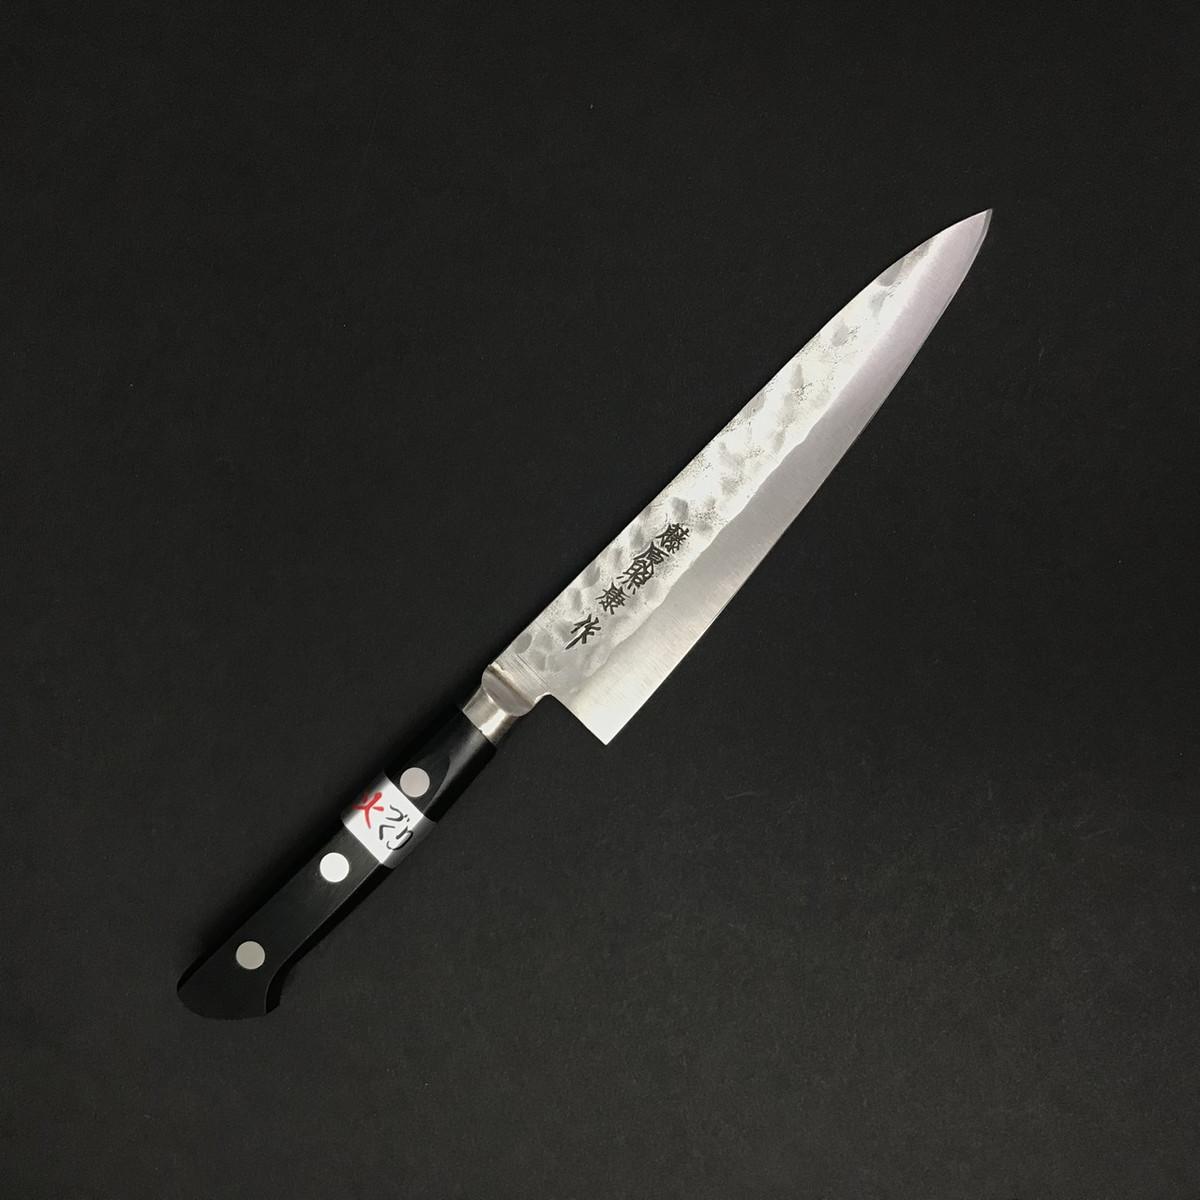 Fujiwara - Maboroshi - Petty 150mm